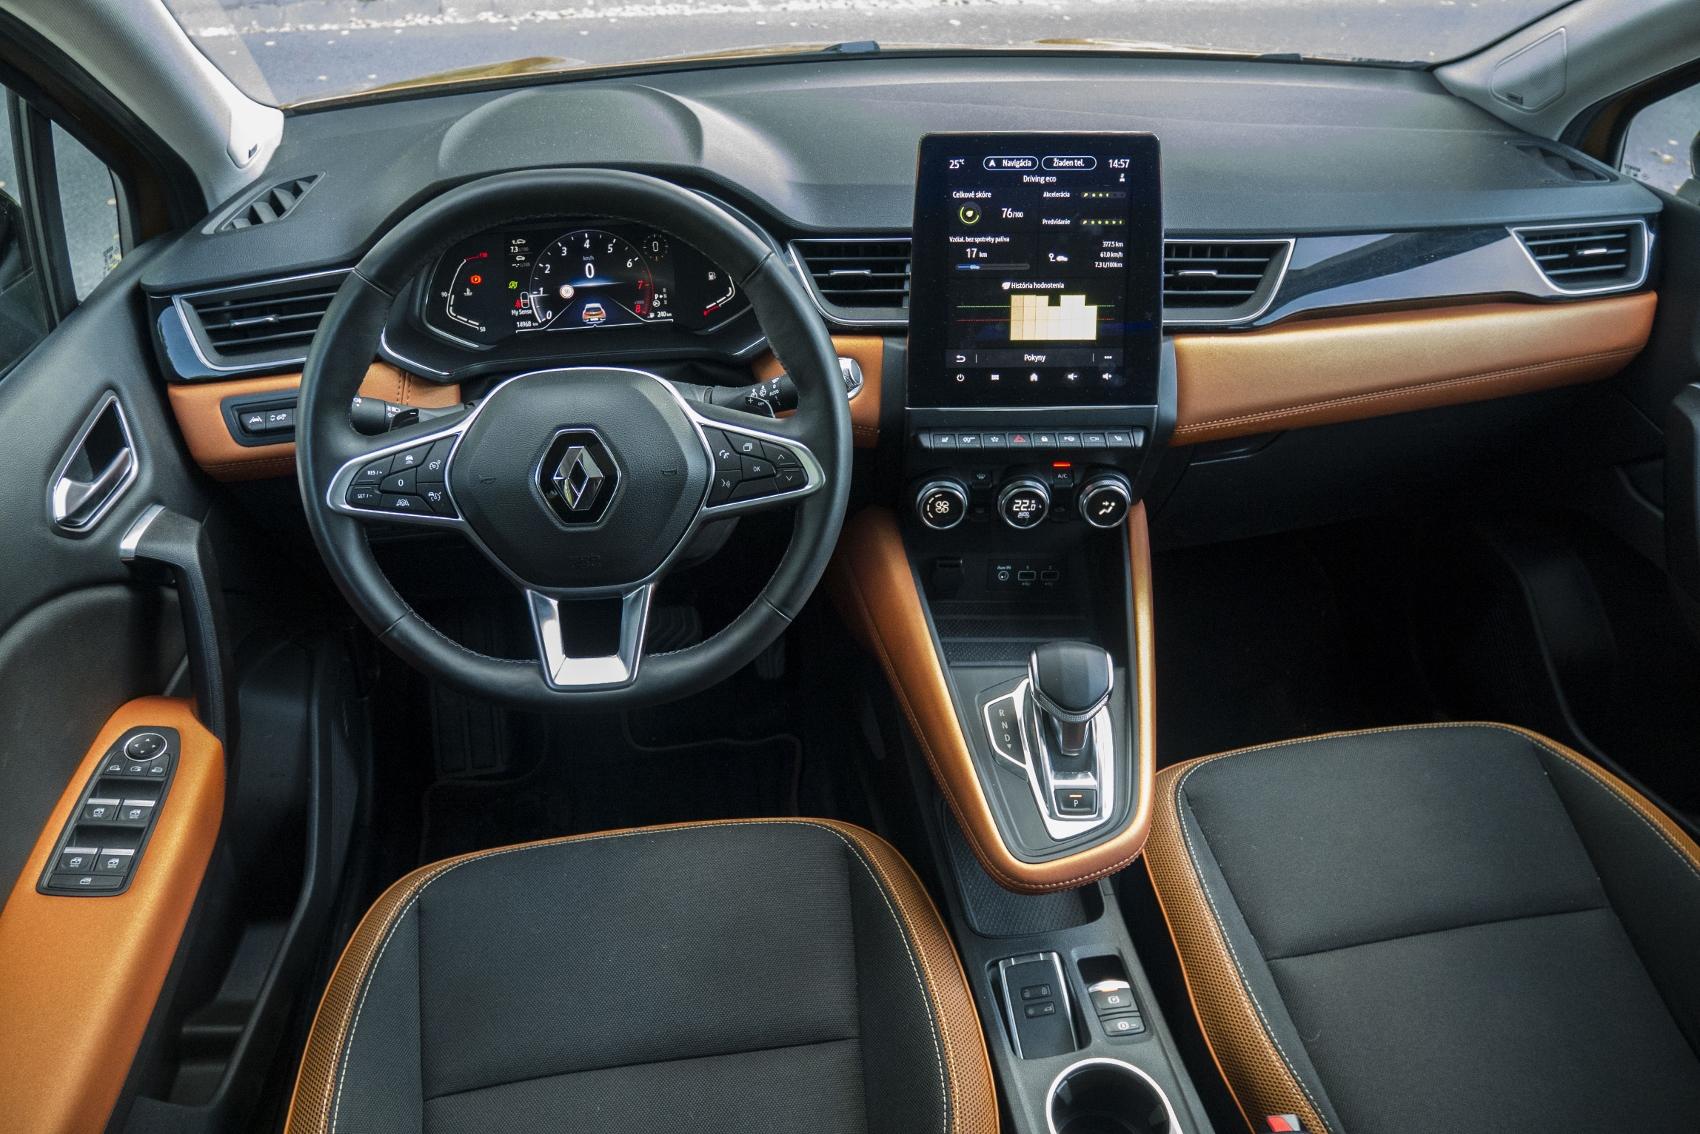 Test: V interiéri sa Renault Captur tvári ako o triedu drahšie auto KuEyhPzYQJ renault-captur-25